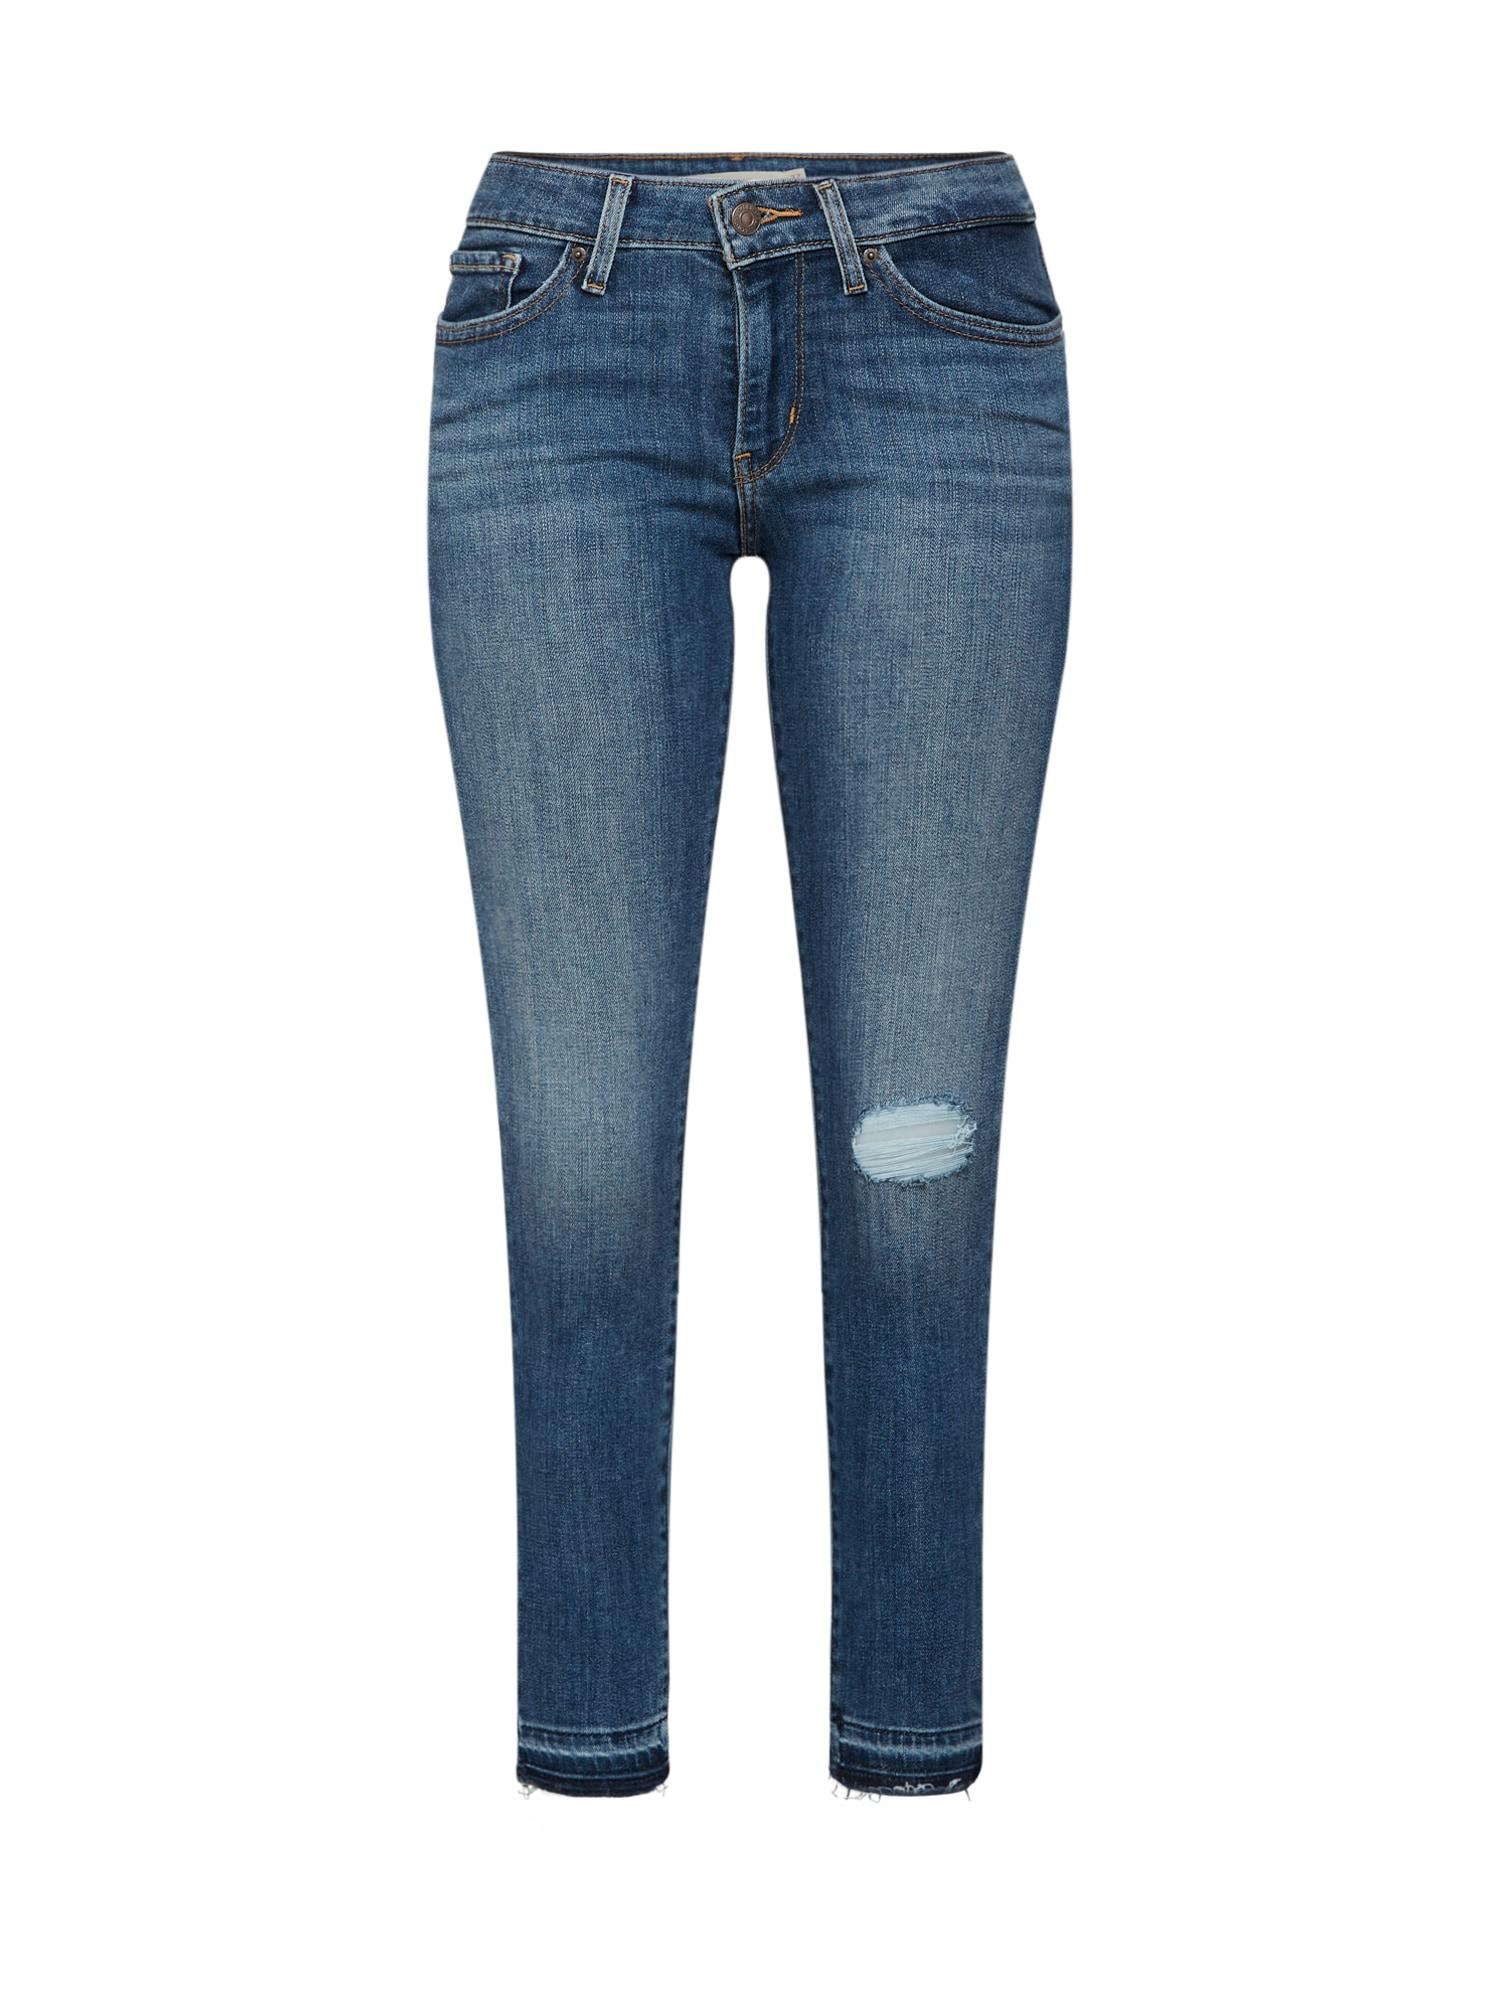 LEVI'S Dames Jeans 711 SKINNY ANKLE blauw denim